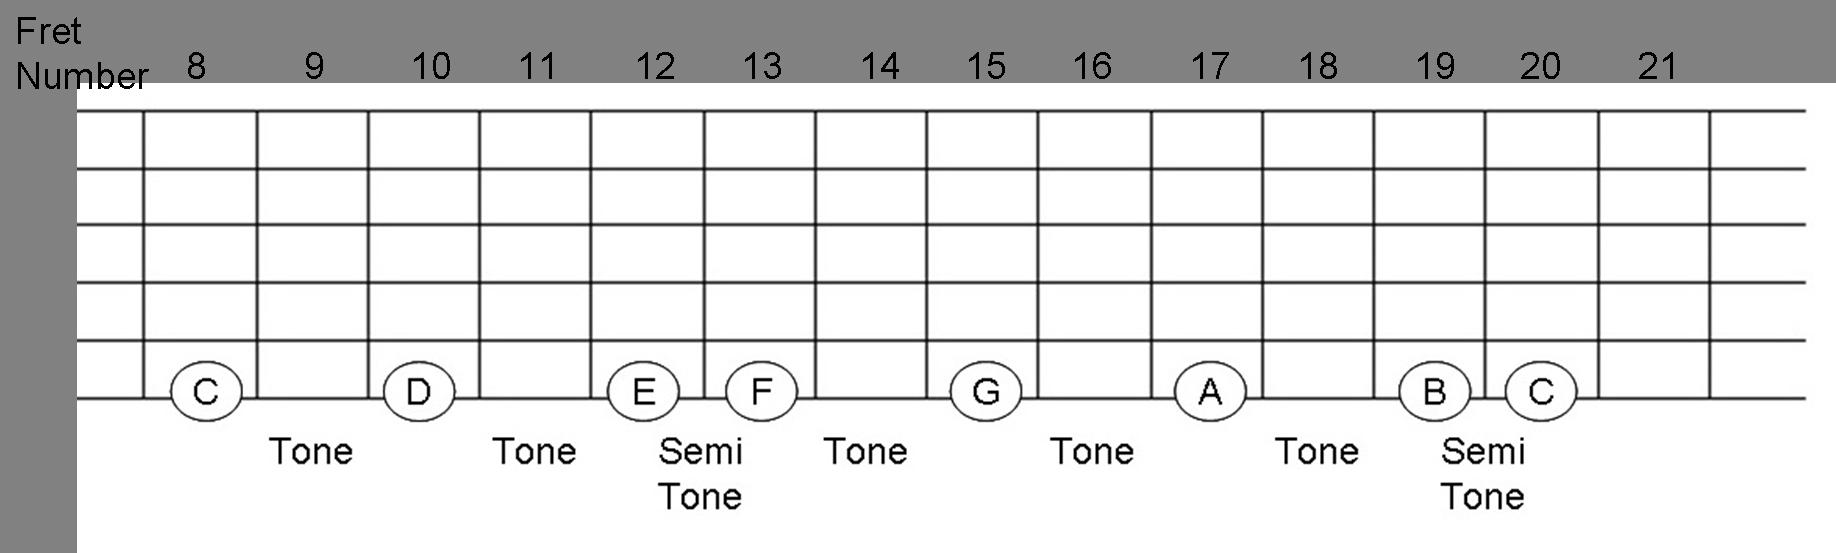 C Major on guitar fretboard